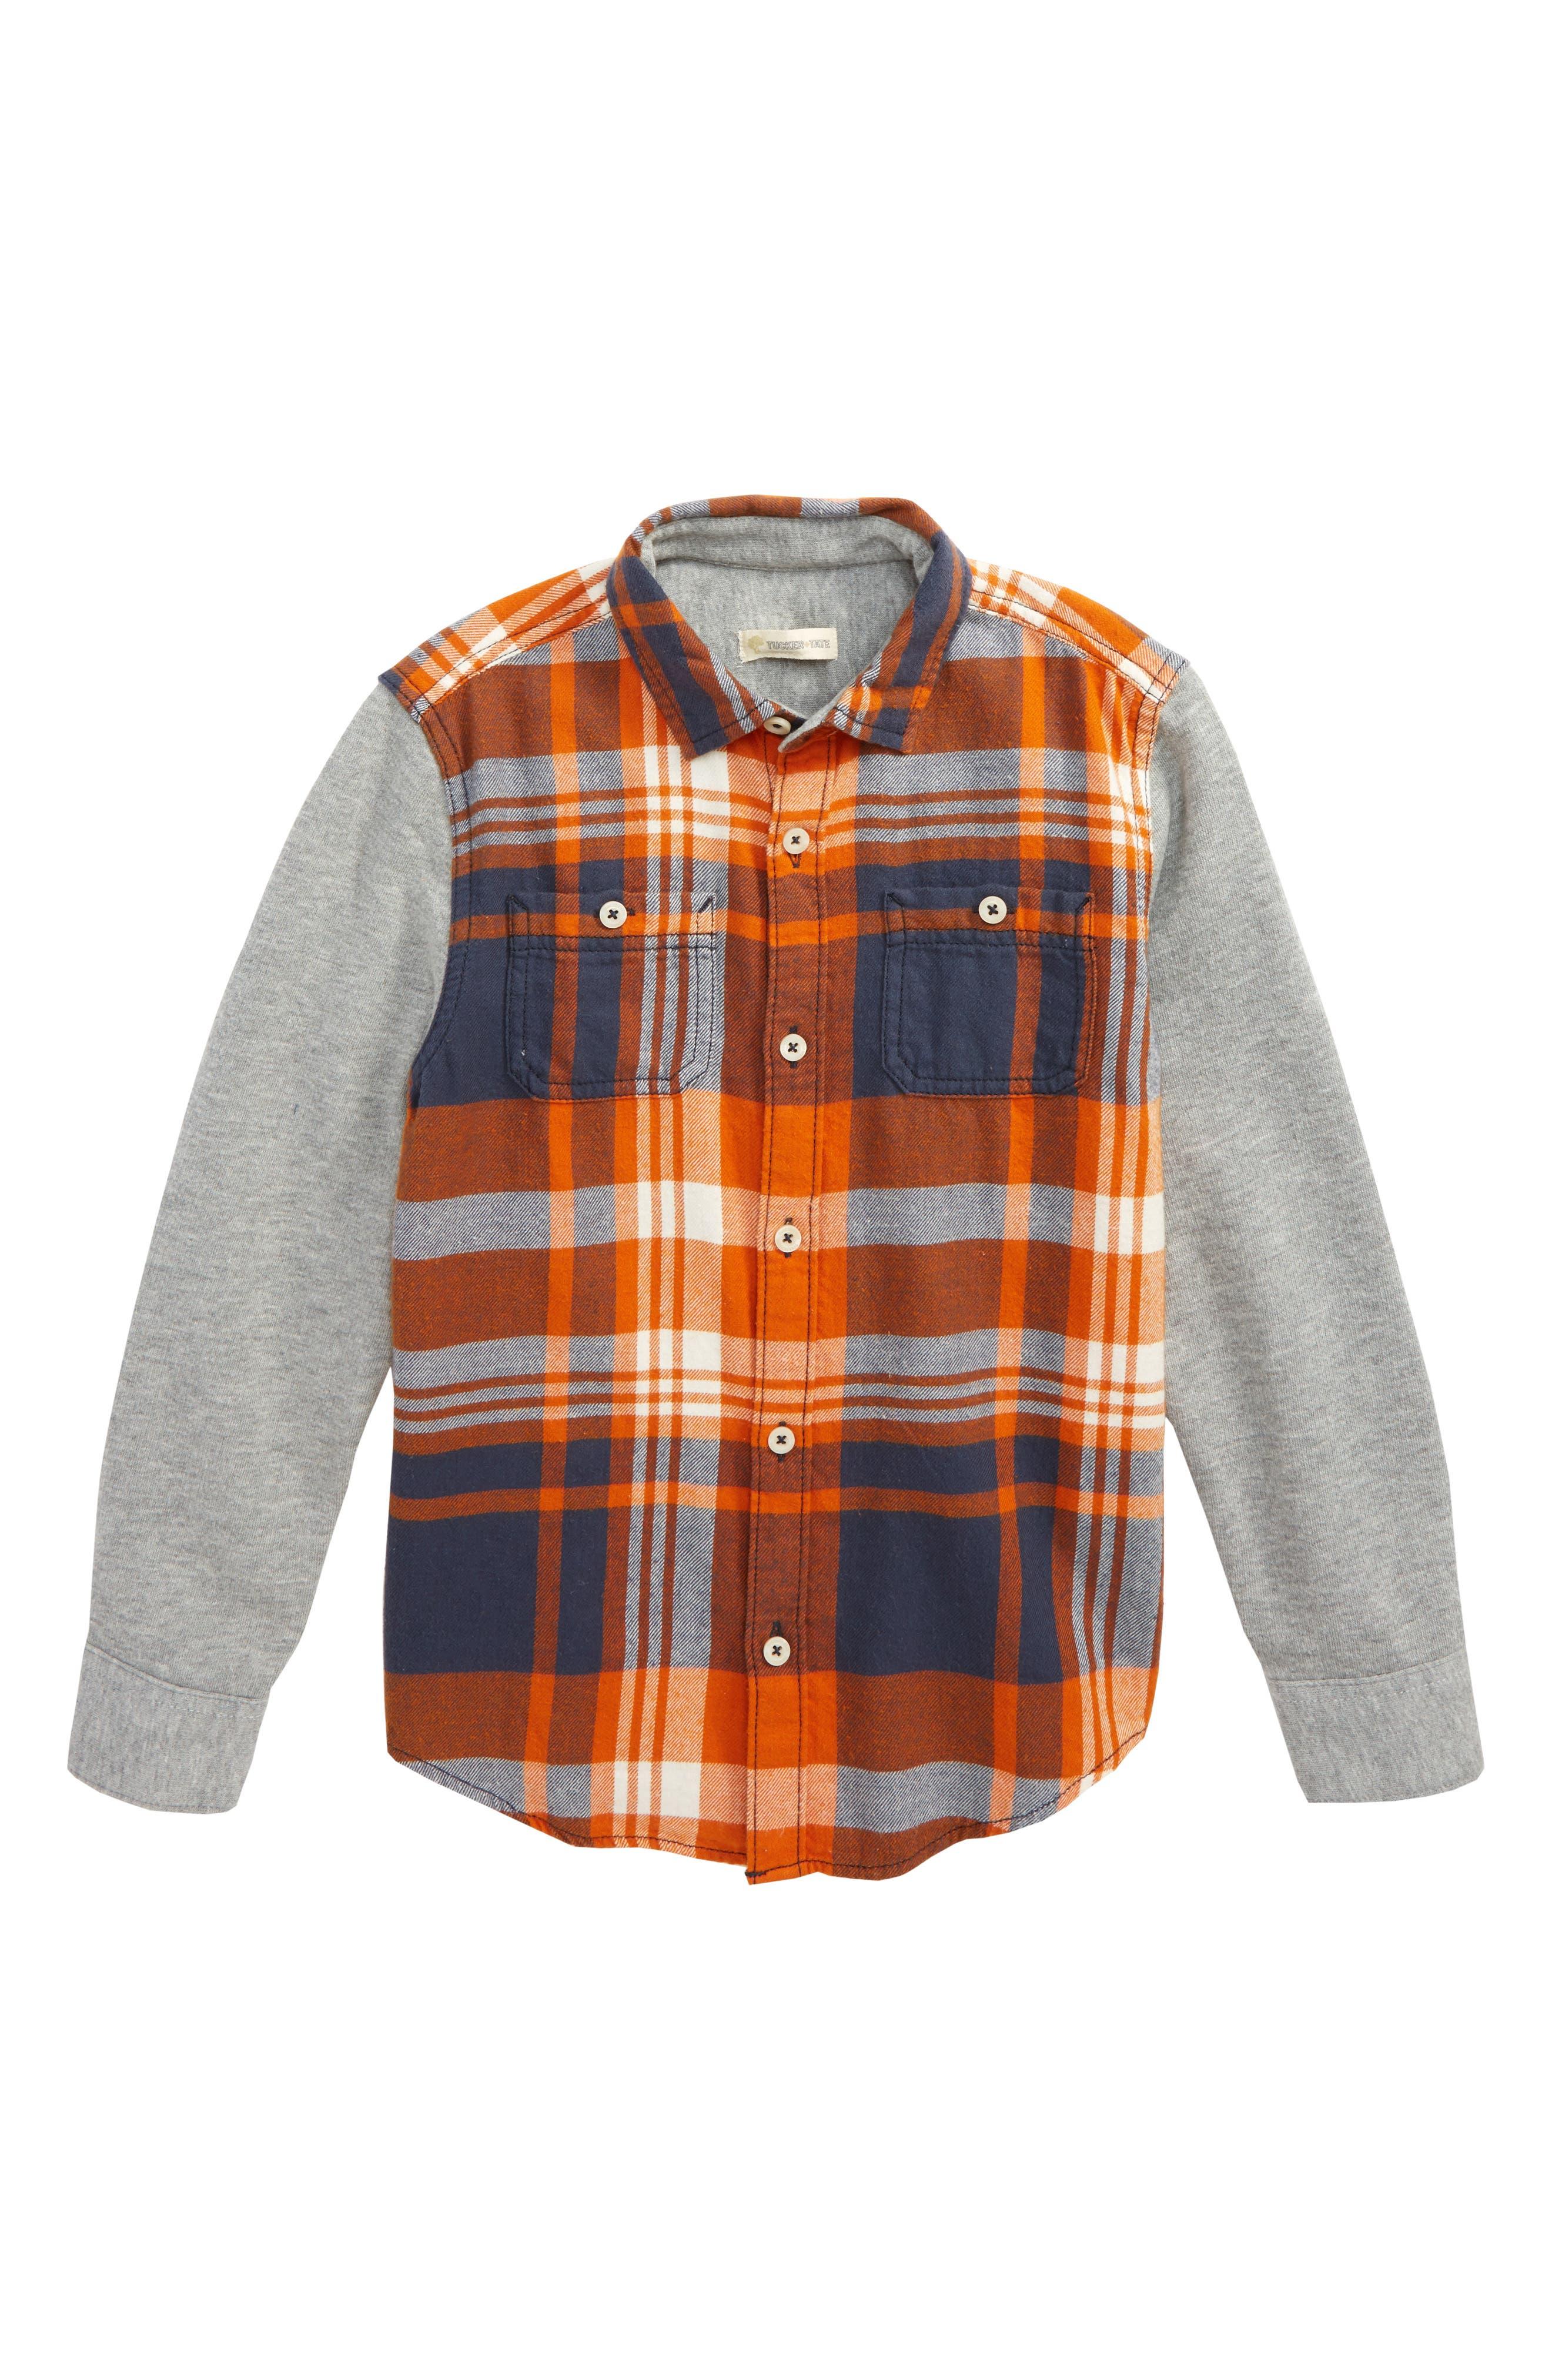 Main Image - Tucker + Tate Woven Plaid Shirt (Toddler Boys & Little Boys)